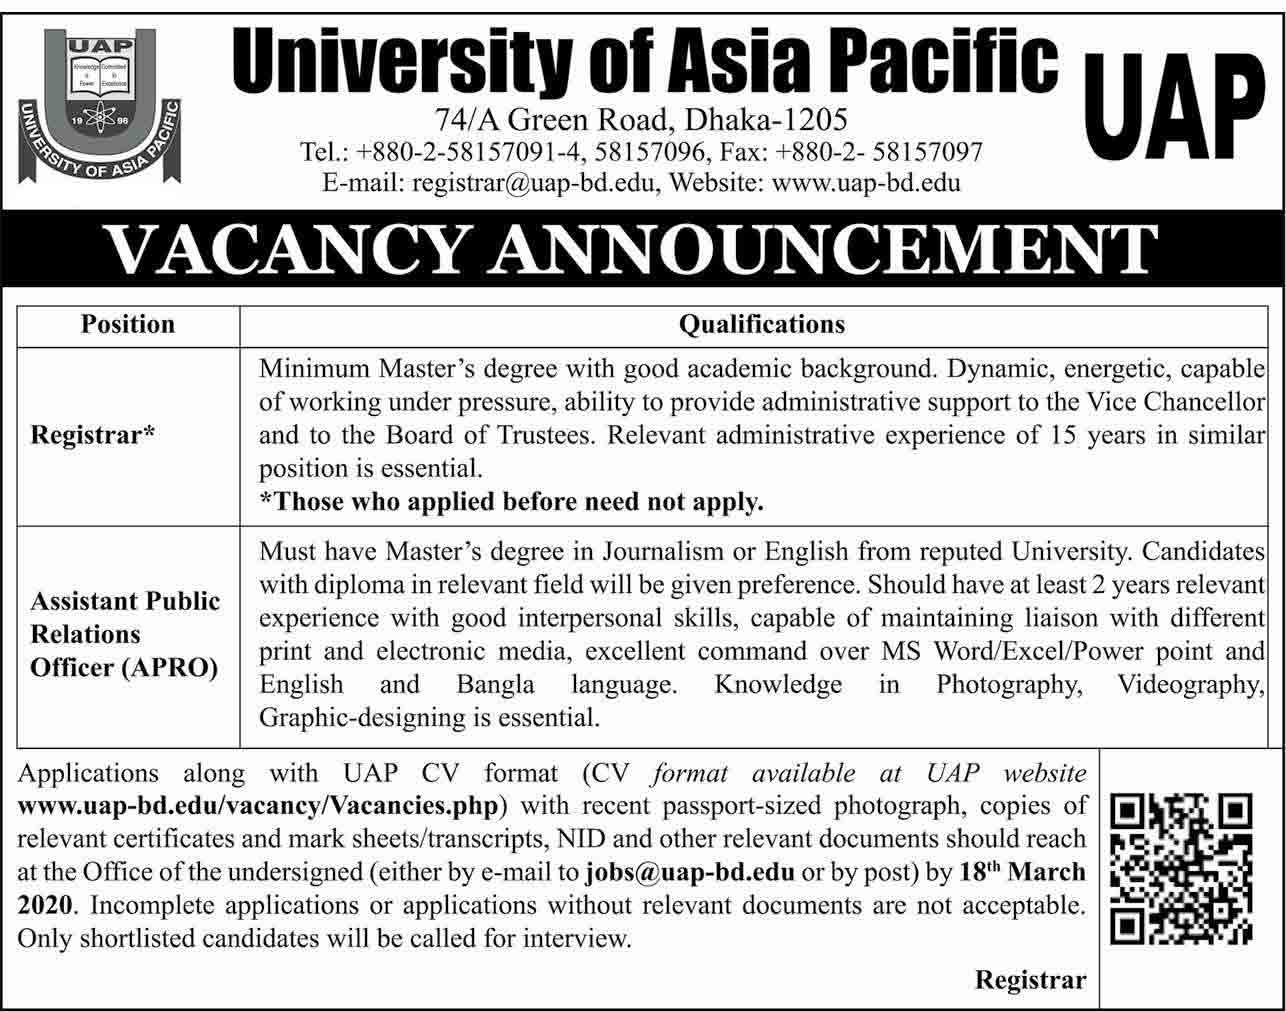 University of Asia Pacific Job Circular 2